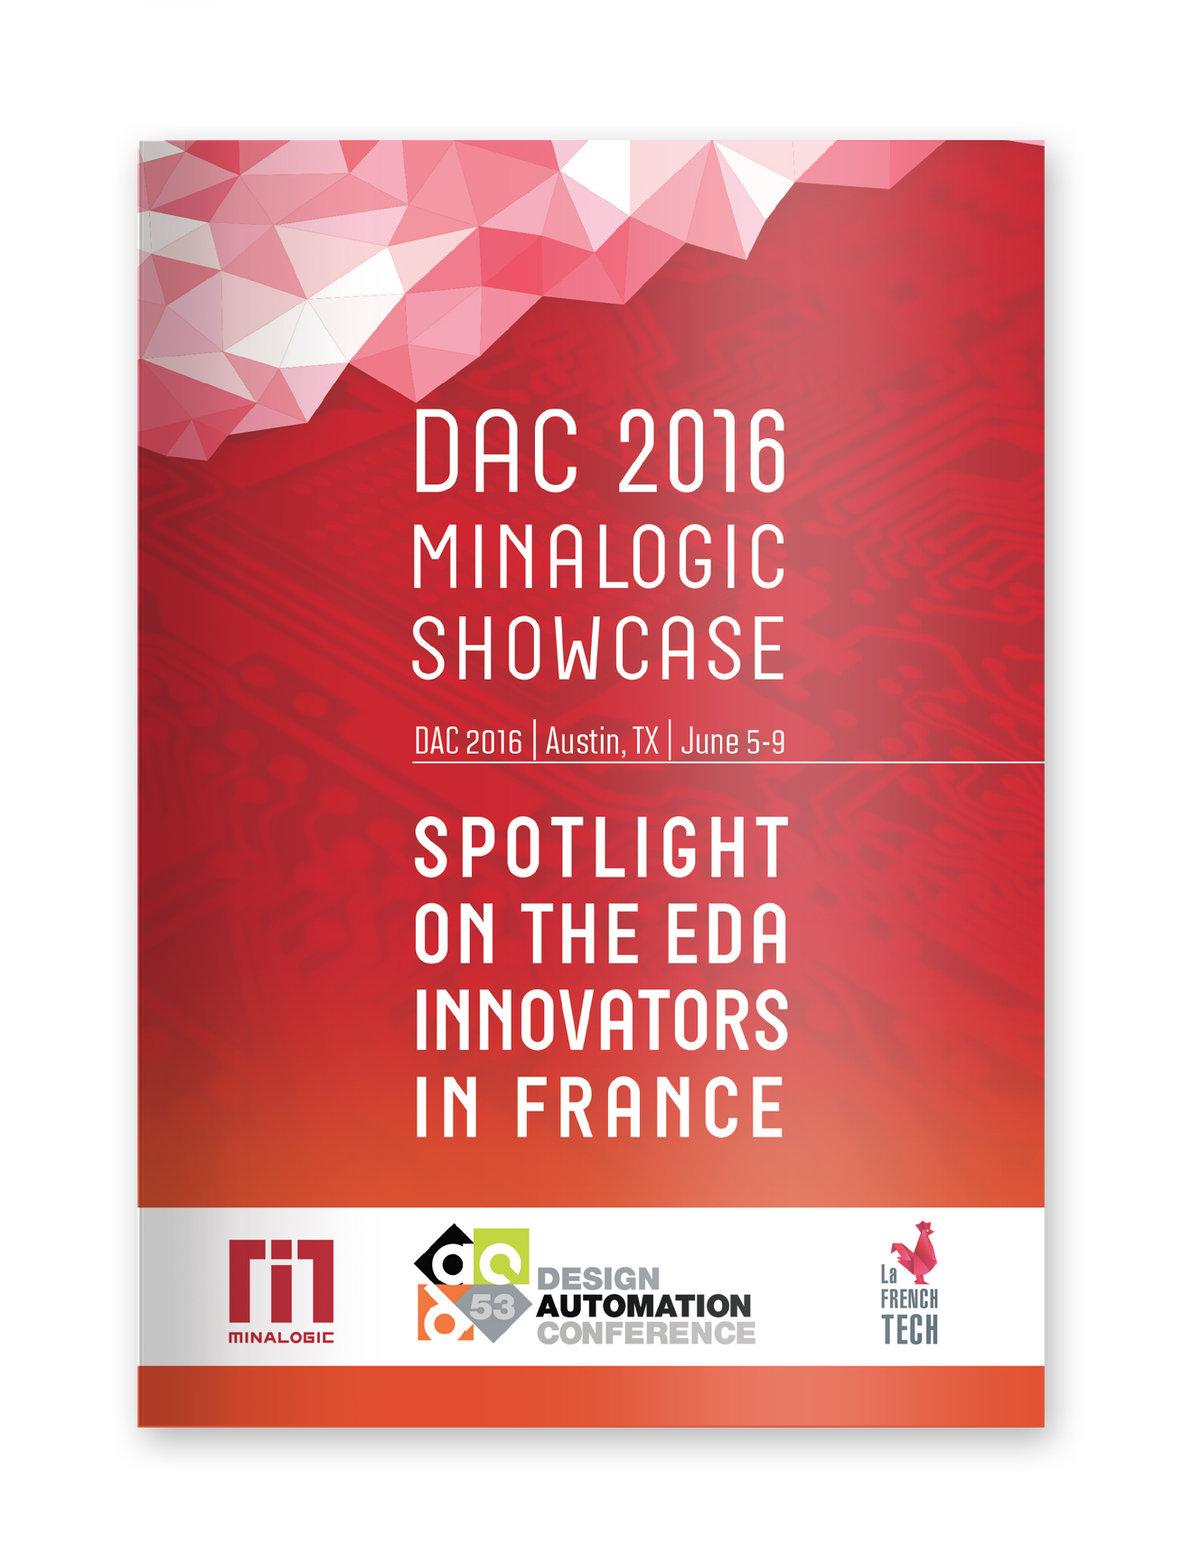 MINALOGIC- DAC 2016